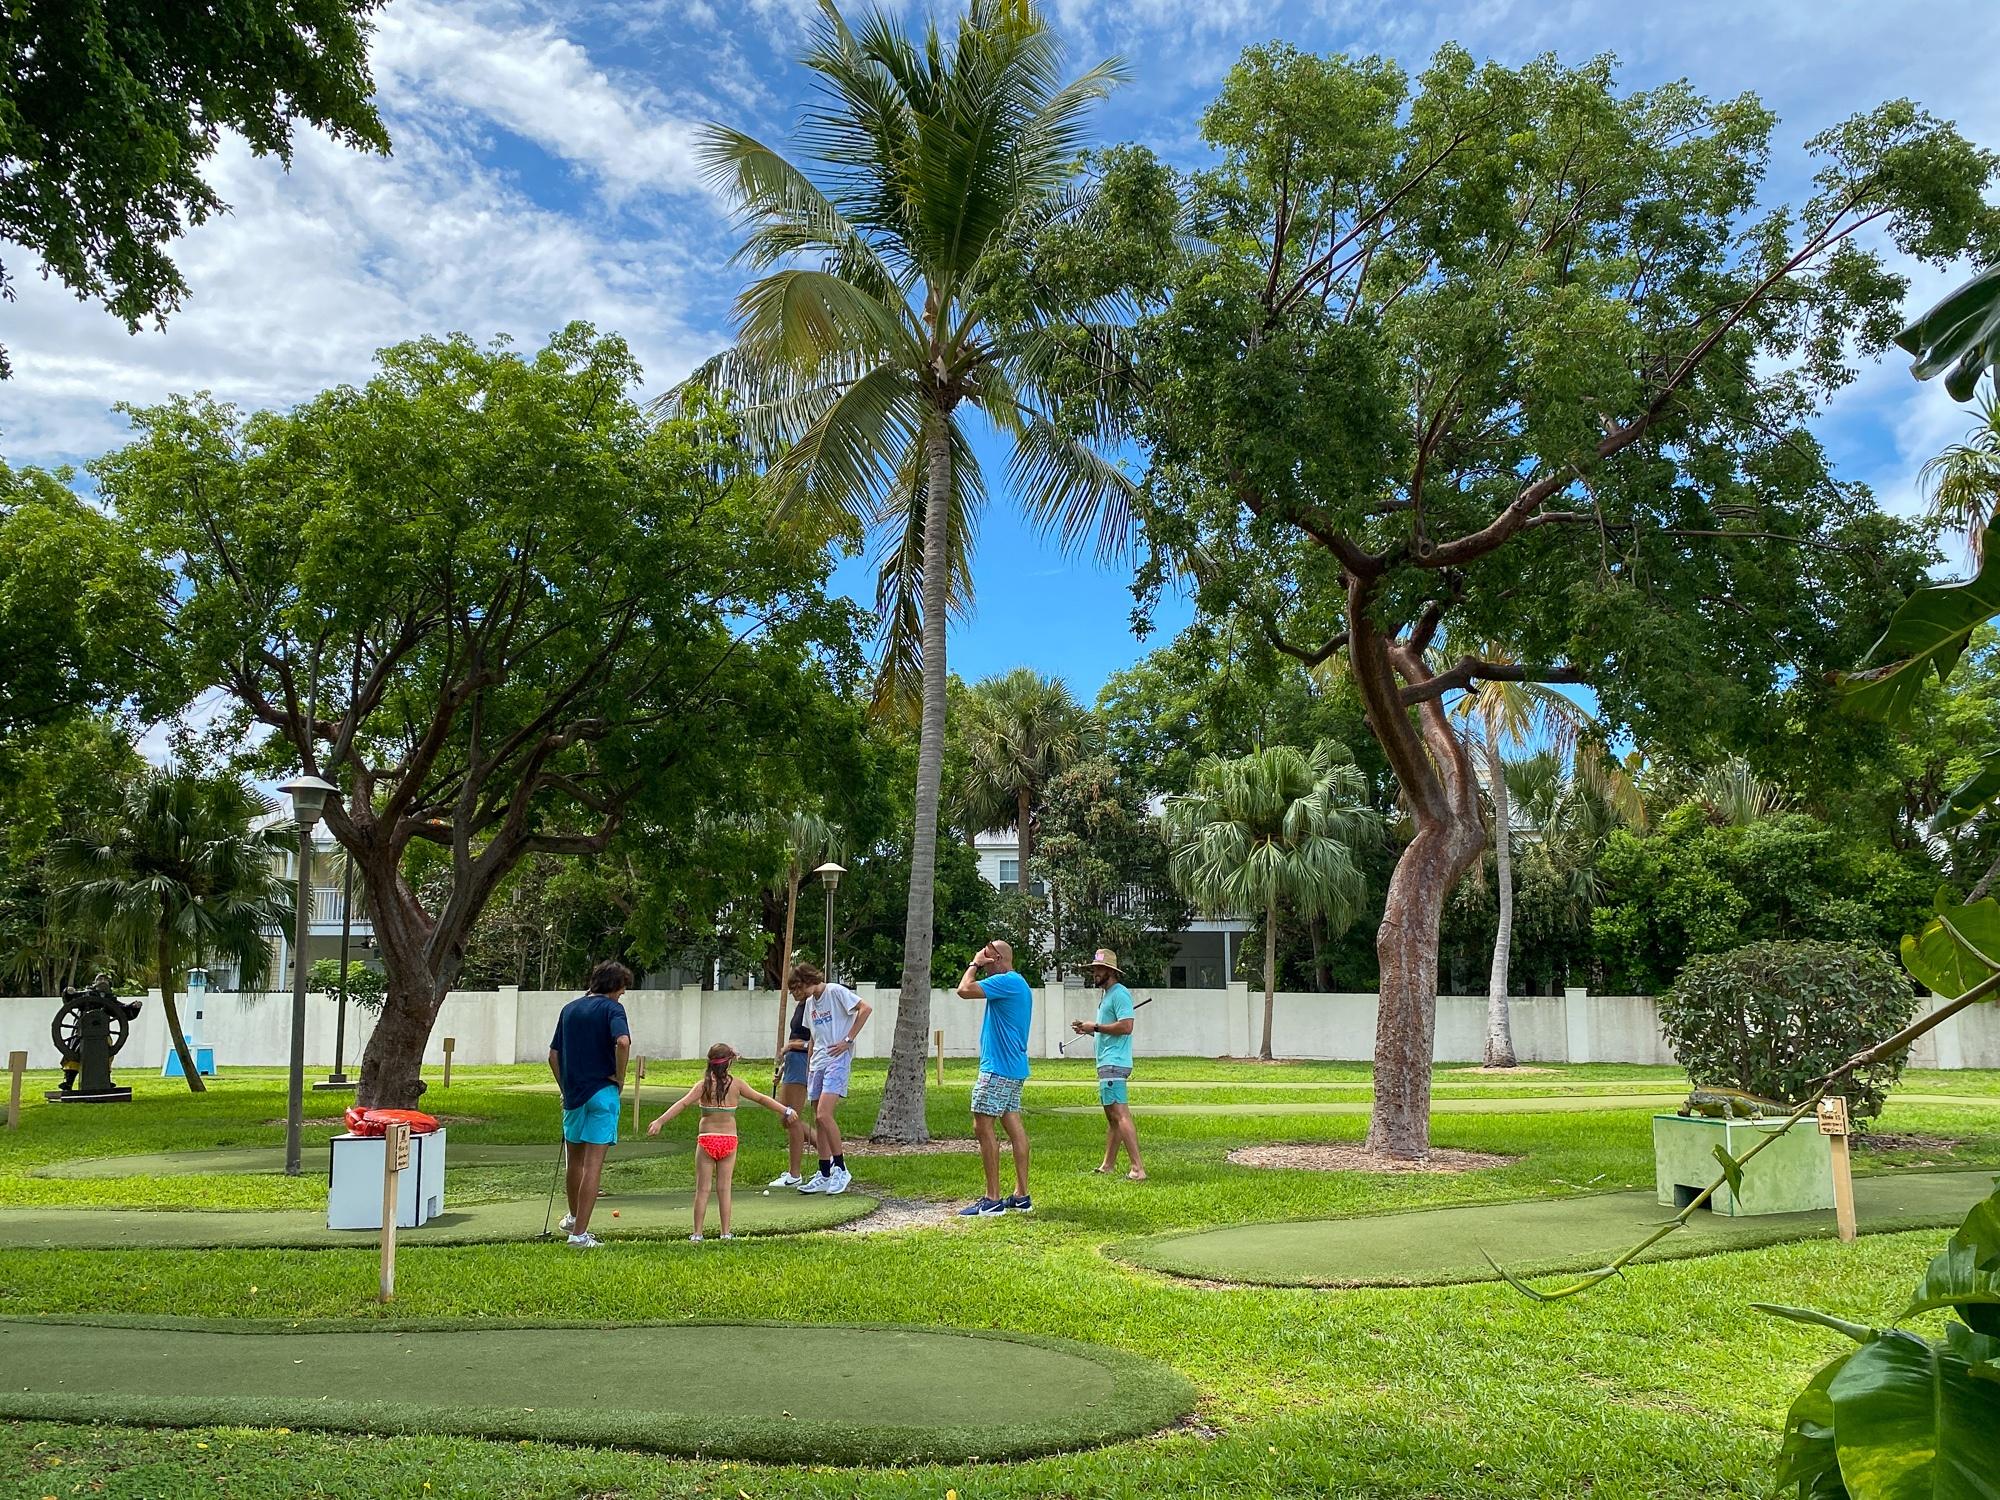 Miniature Golf at Hawks Cay Resort with kids